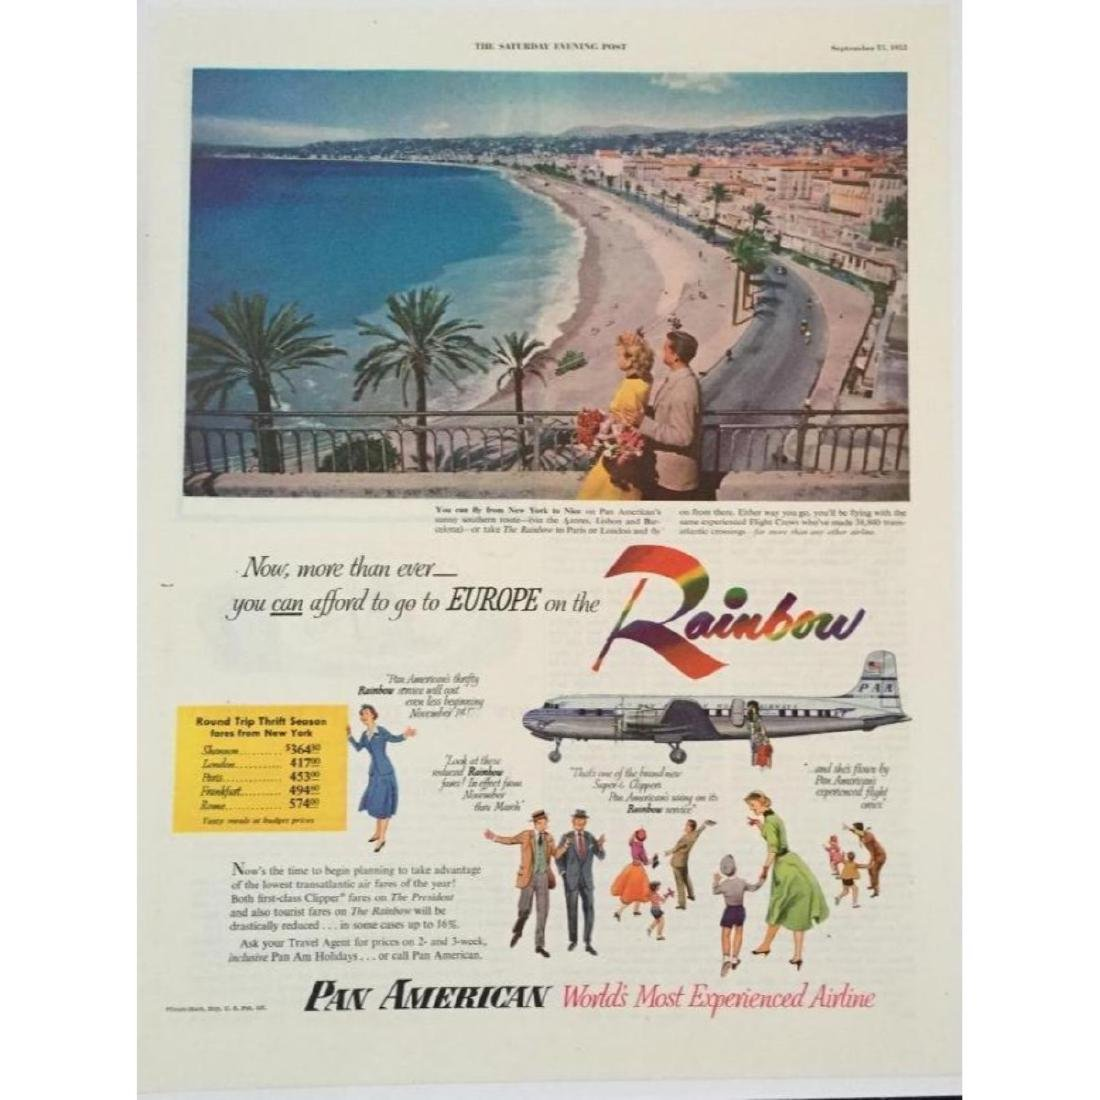 1952 Pan American Airlines European Travel Ad